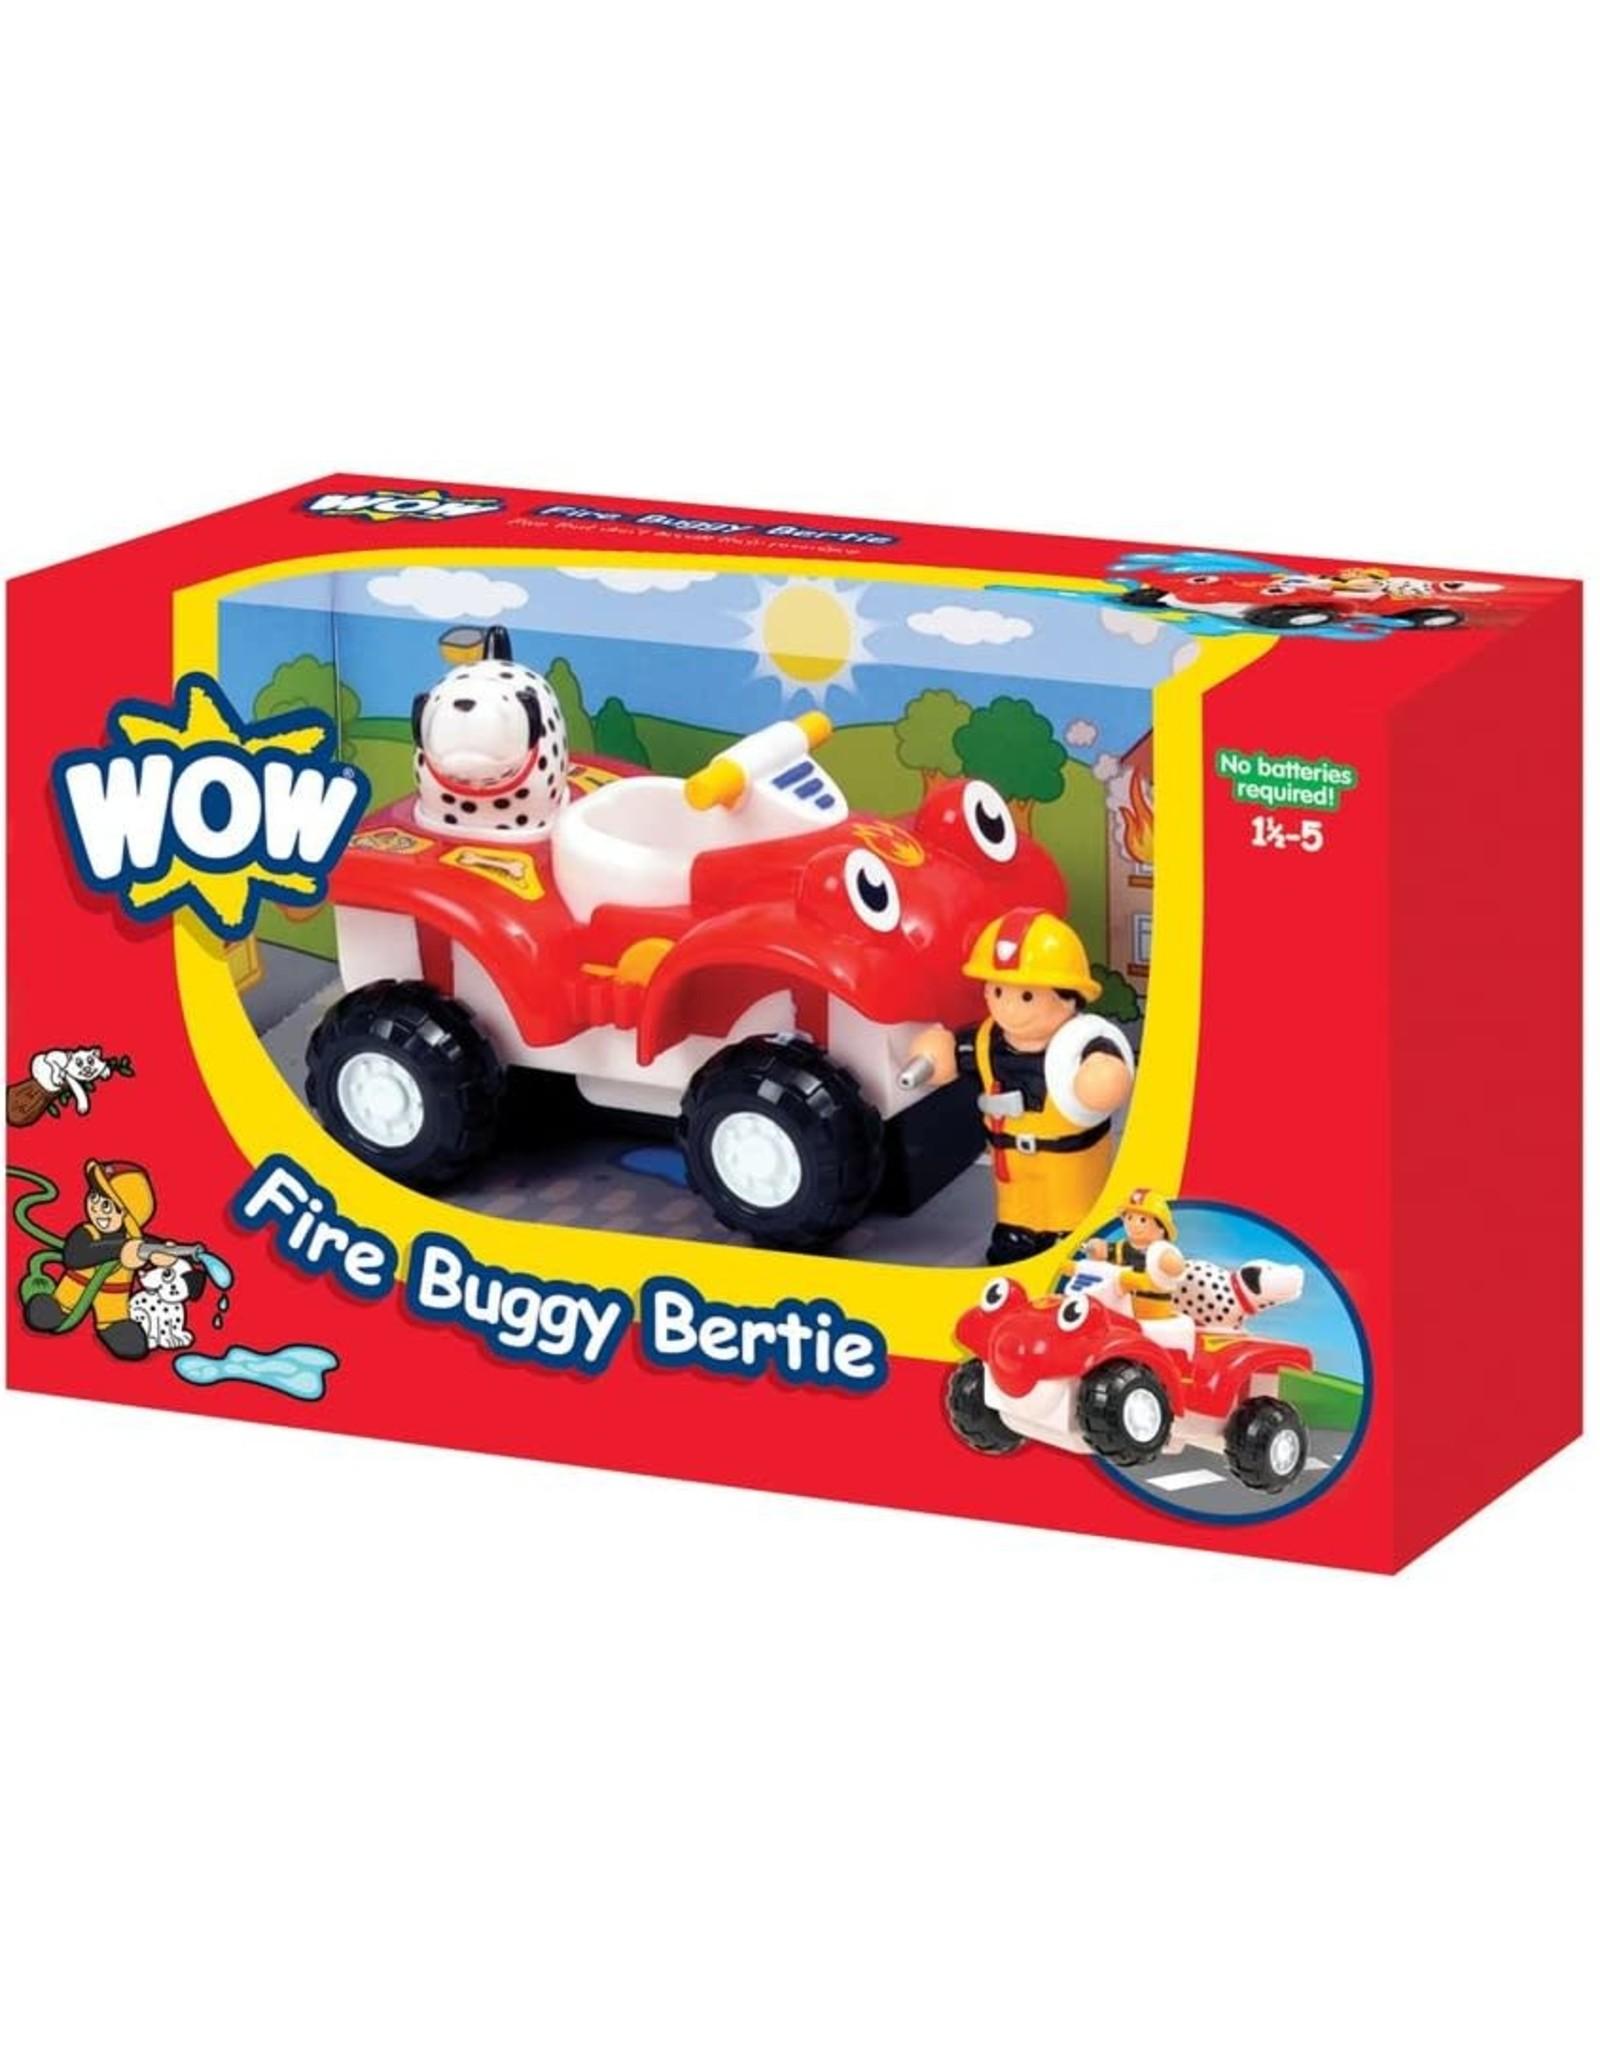 Wow Fire Buggy Bertie